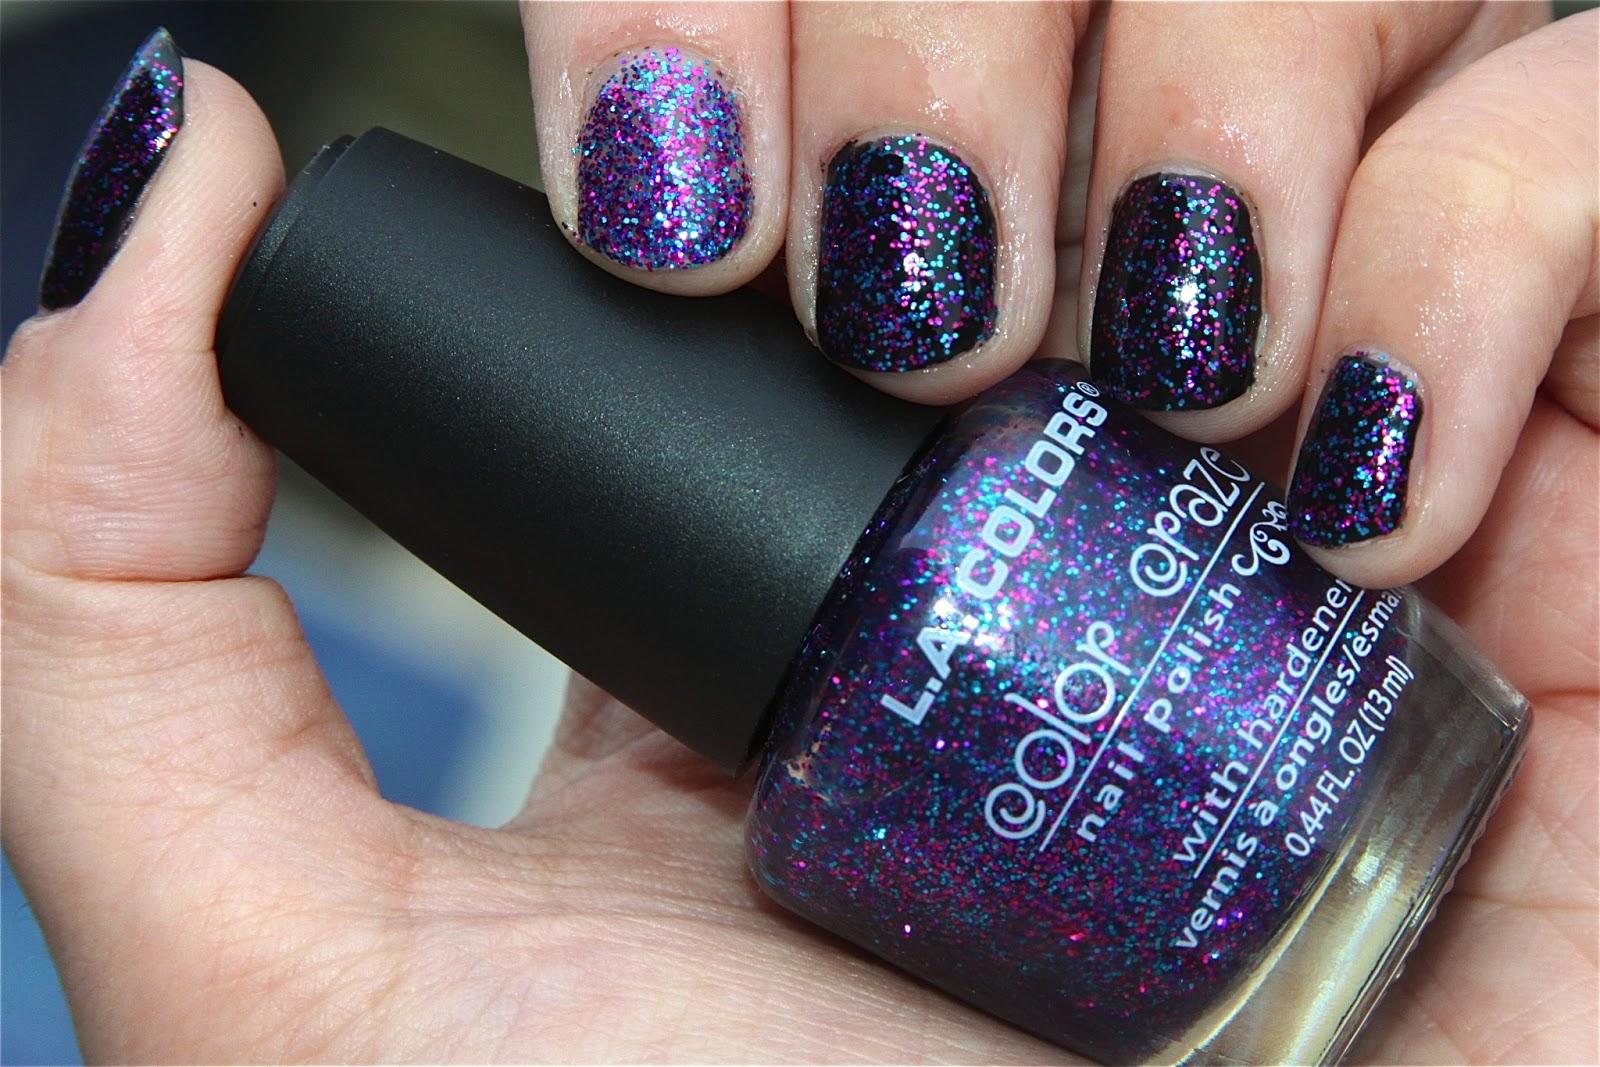 Glitter Kitty: LA Colors Color Craze Nail Polish - Jewel Tone